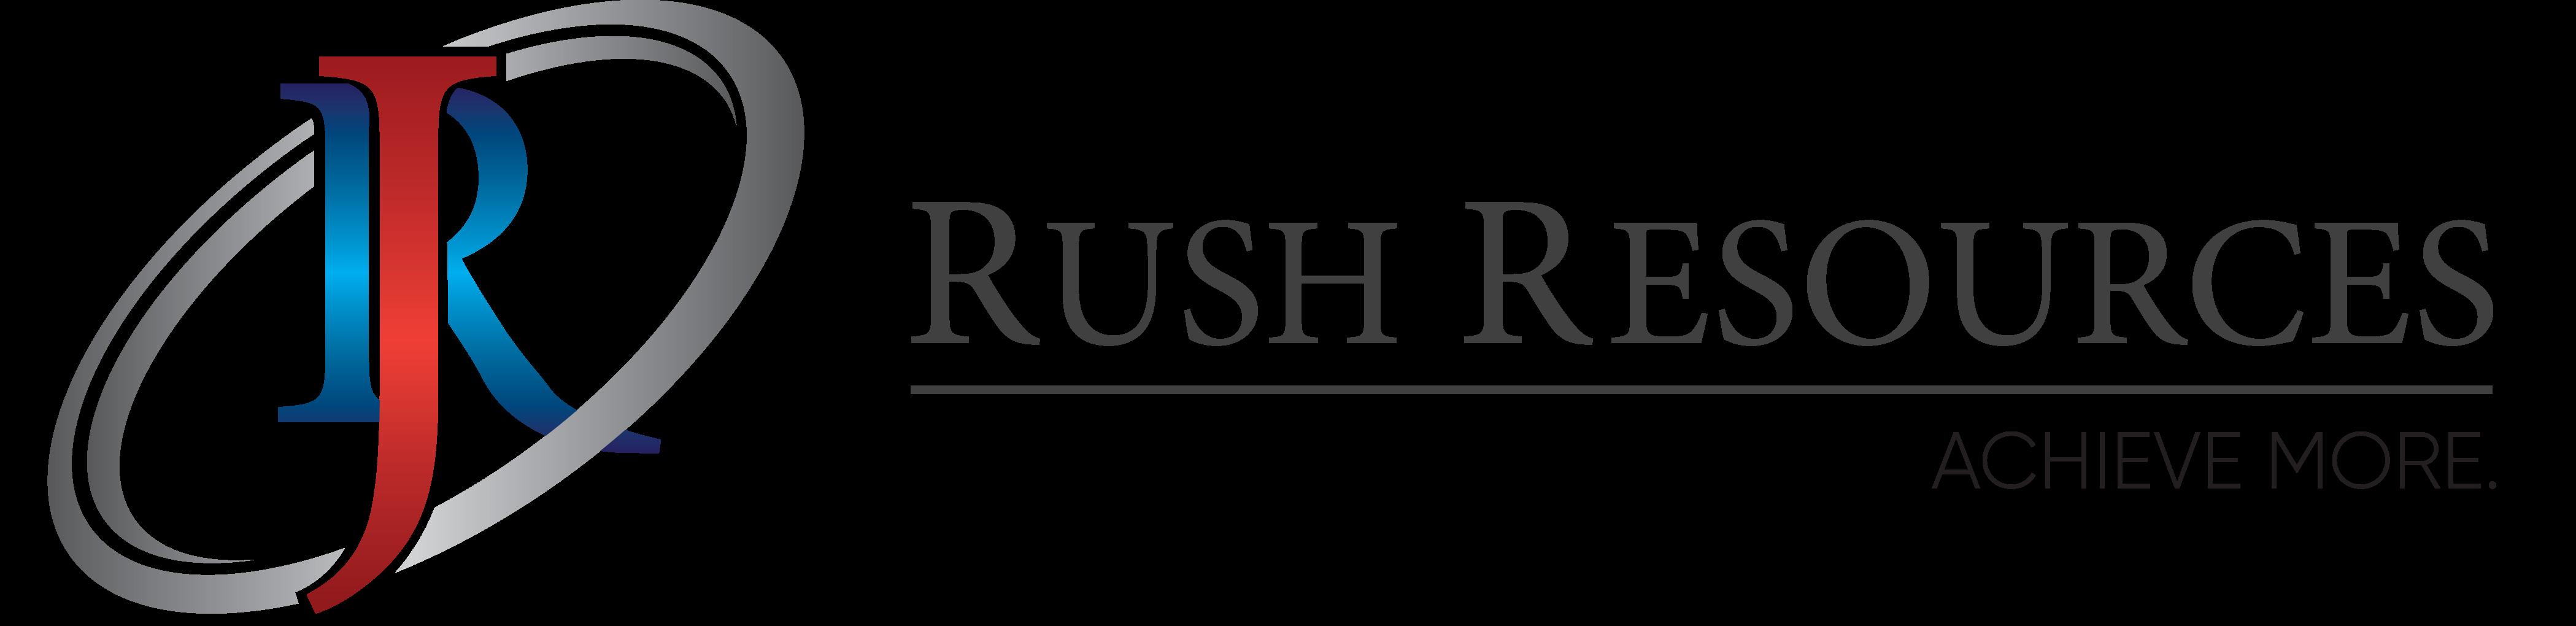 Rush Resources